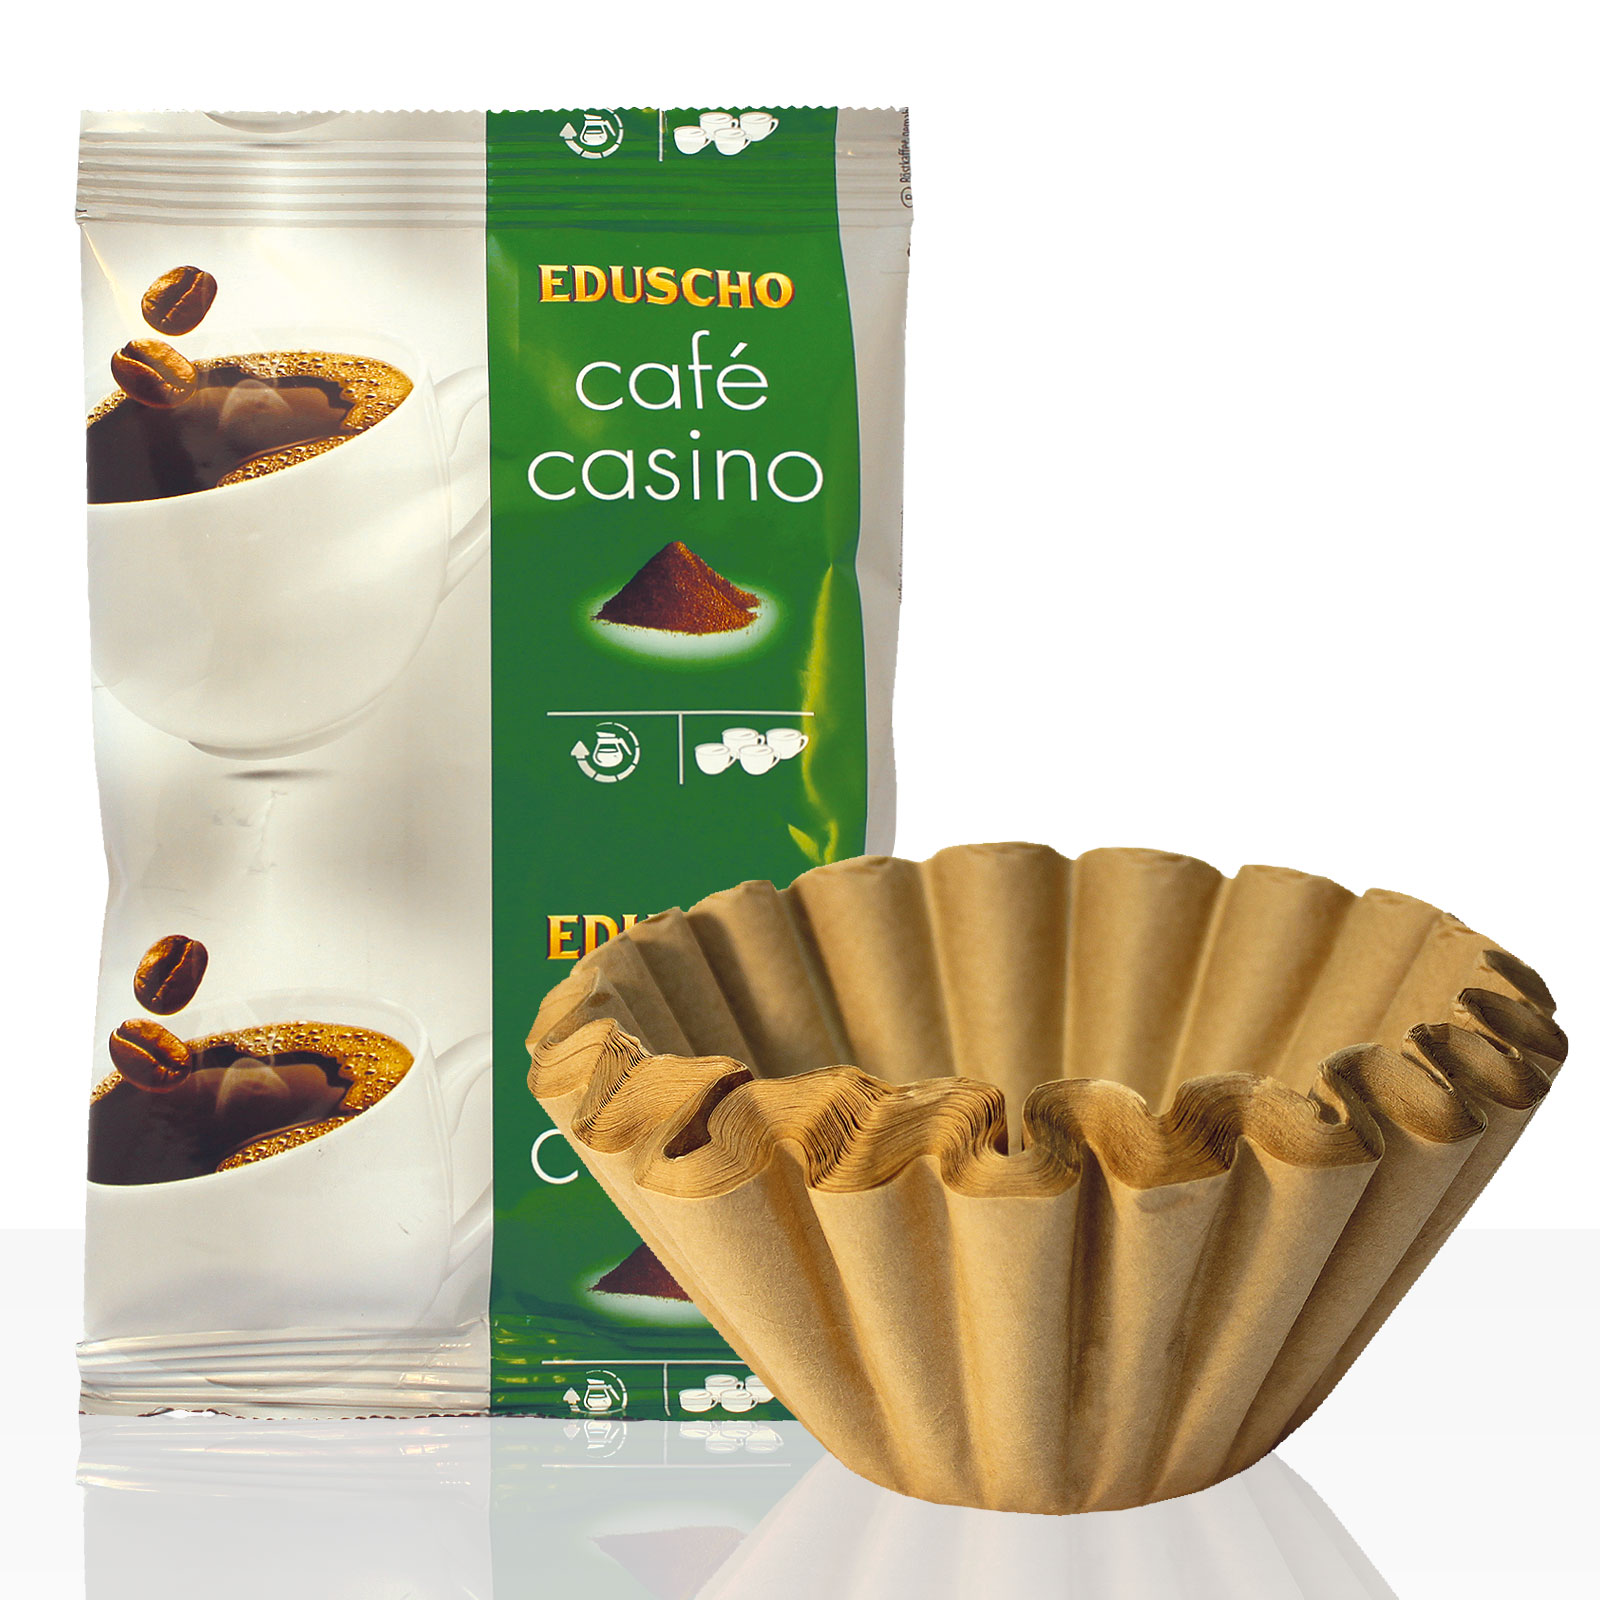 Tchibo / Eduscho Café Casino Plus 42 x 60g Kaffee gemahlen + 50 Korbfilter, Servicepaket